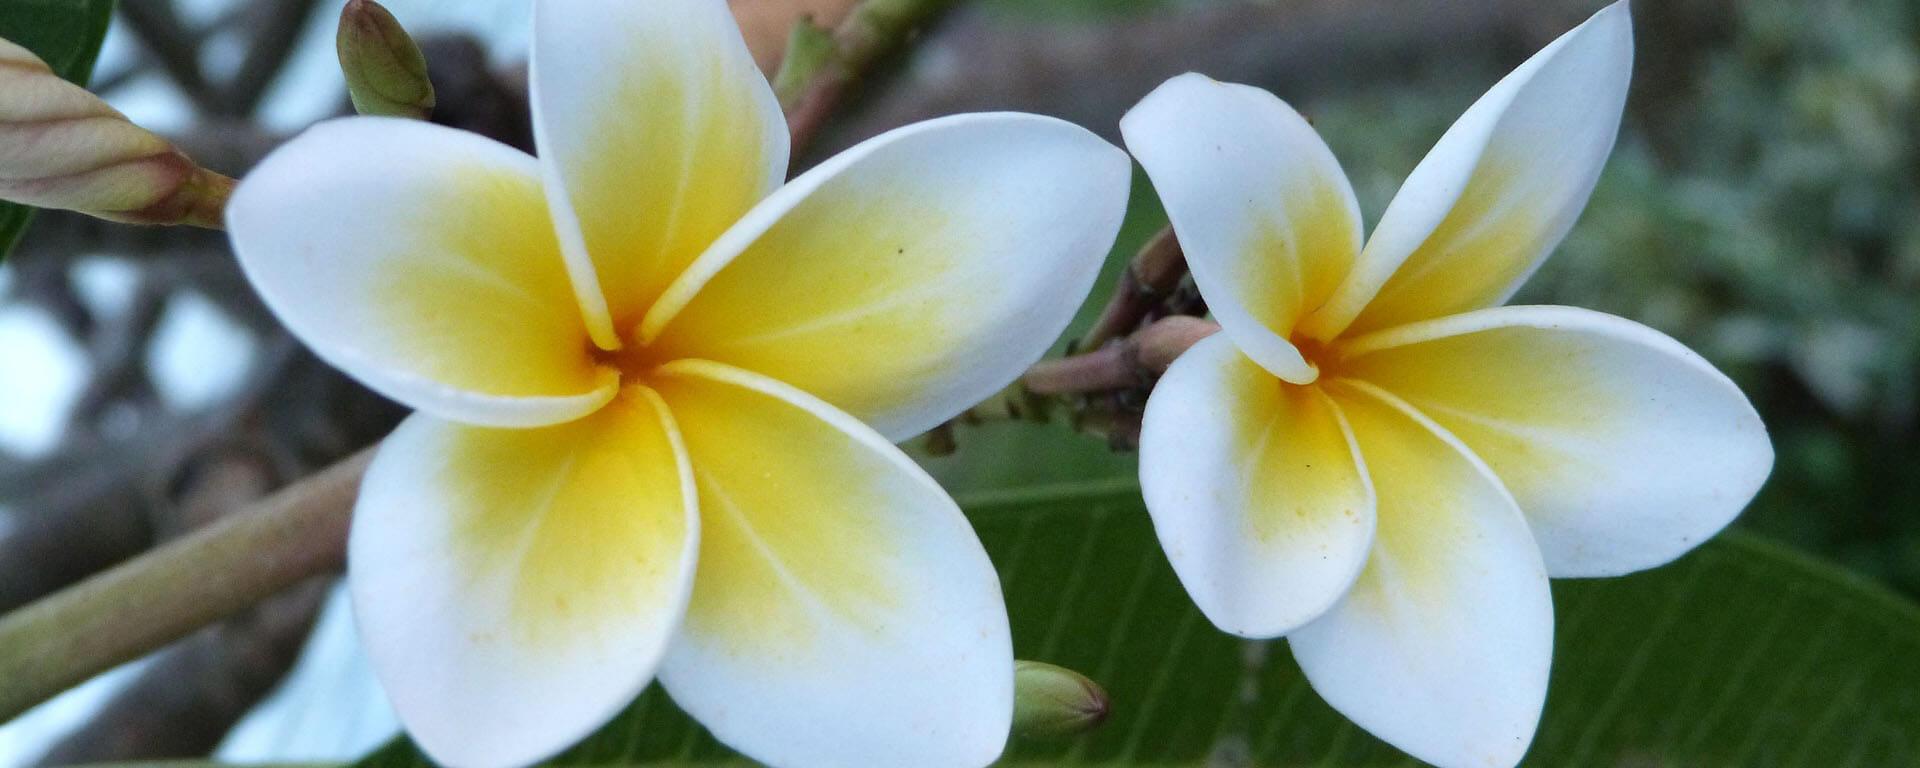 6-tips-to-create-a-Balinese-inspired-garden-2.jpg